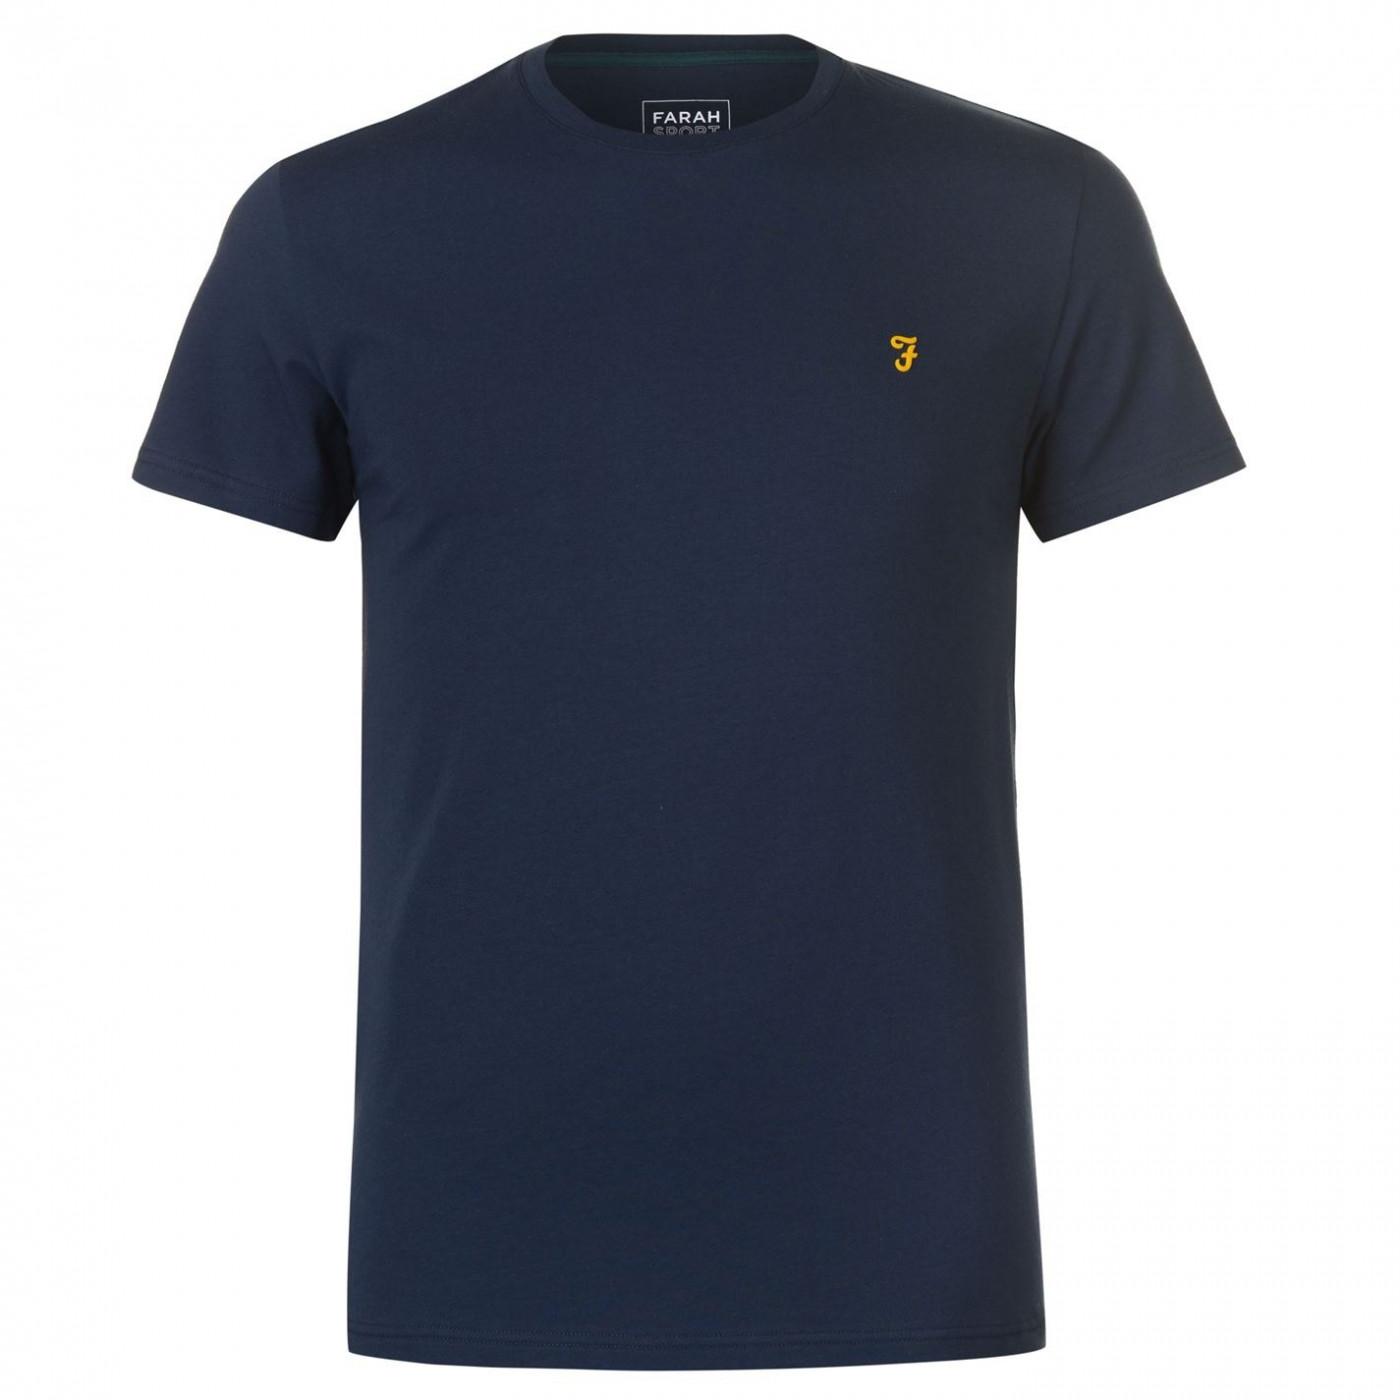 Farah Sport Robins T Shirt